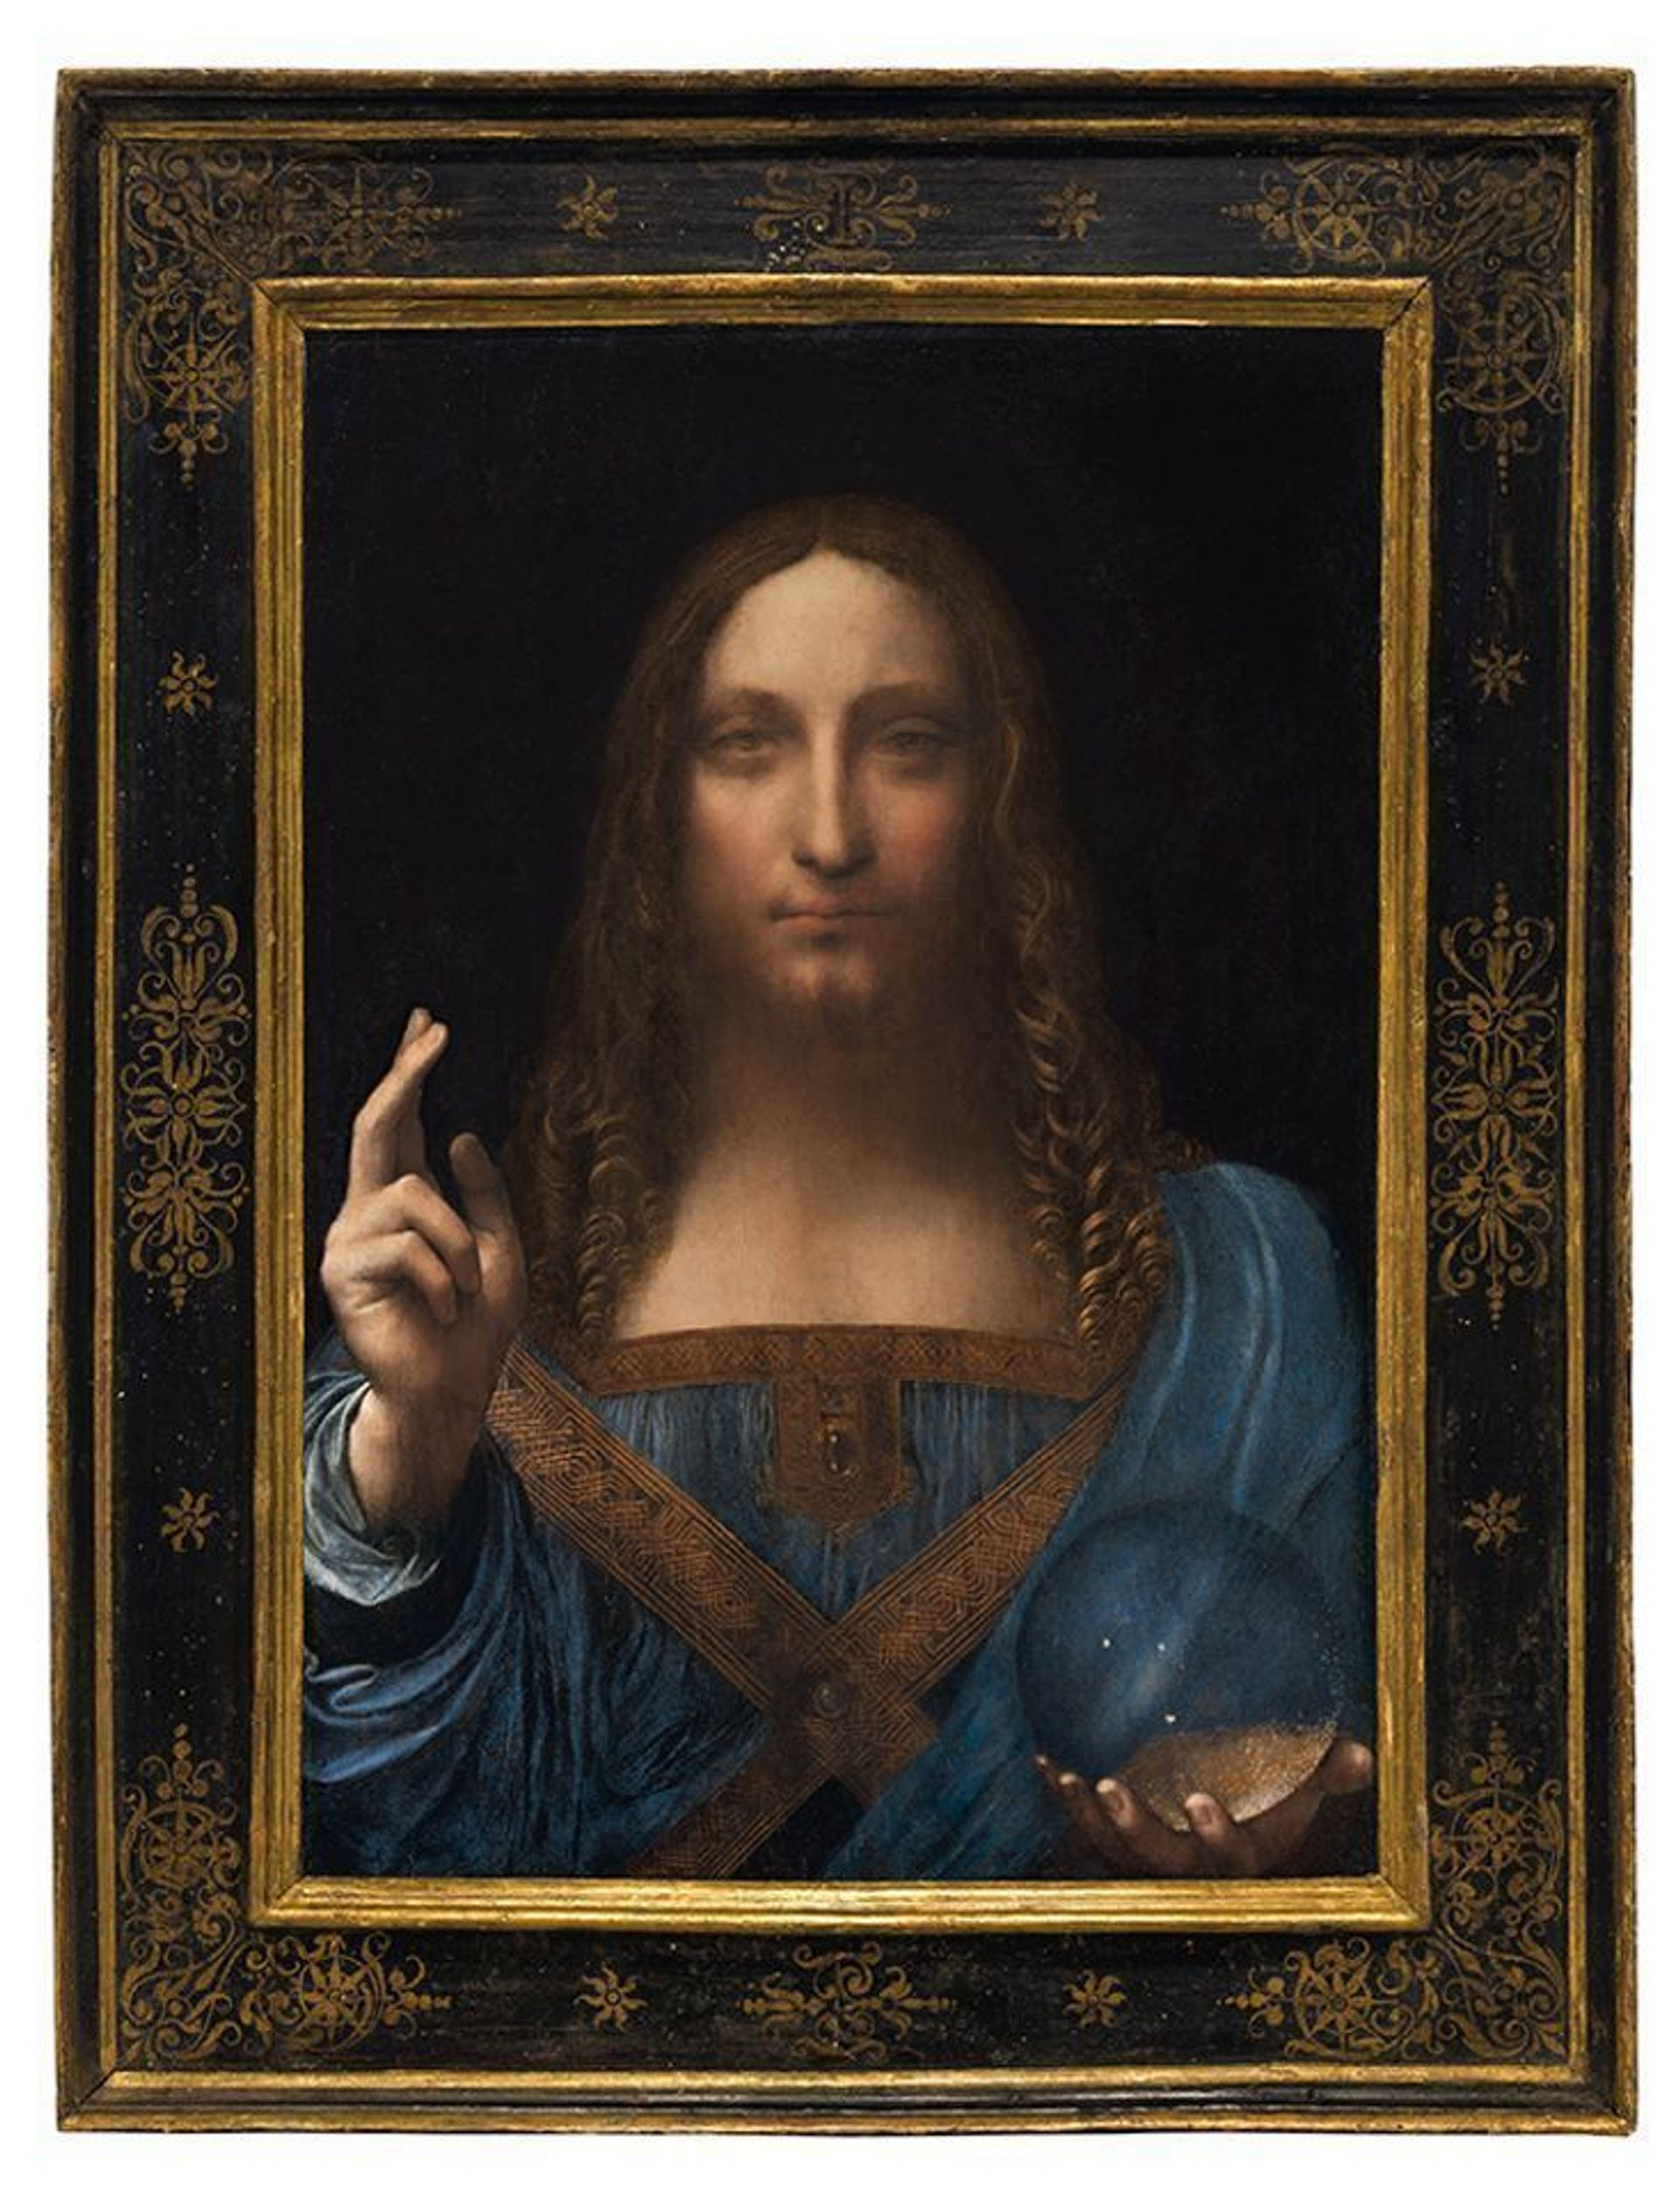 Leonardo's Salvator Mundi is unlikely to make an appearance in Paris